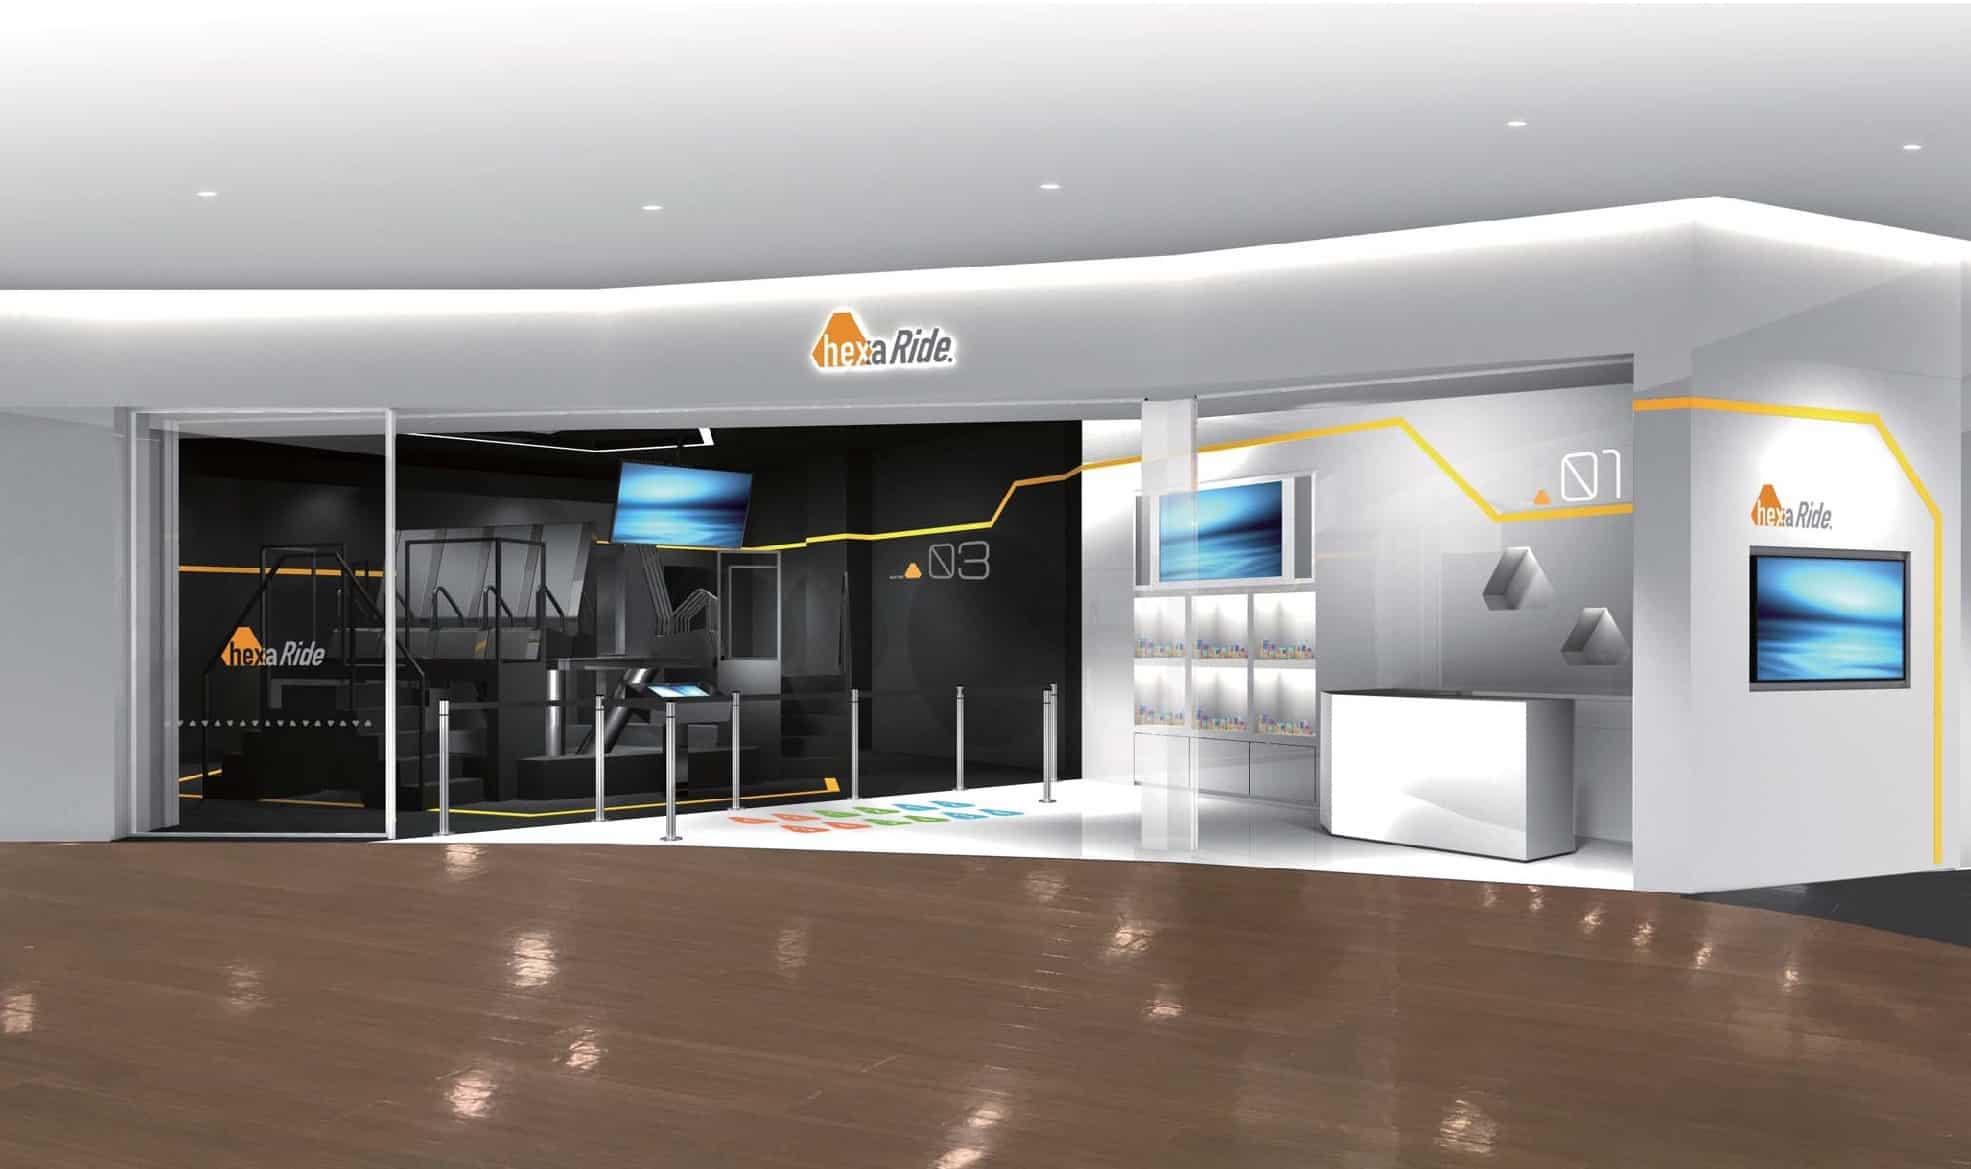 hexaRide VR สวนสนุกระบบเทคโนโลยีล้ำสมัยที่แรกของญี่ปุ่น